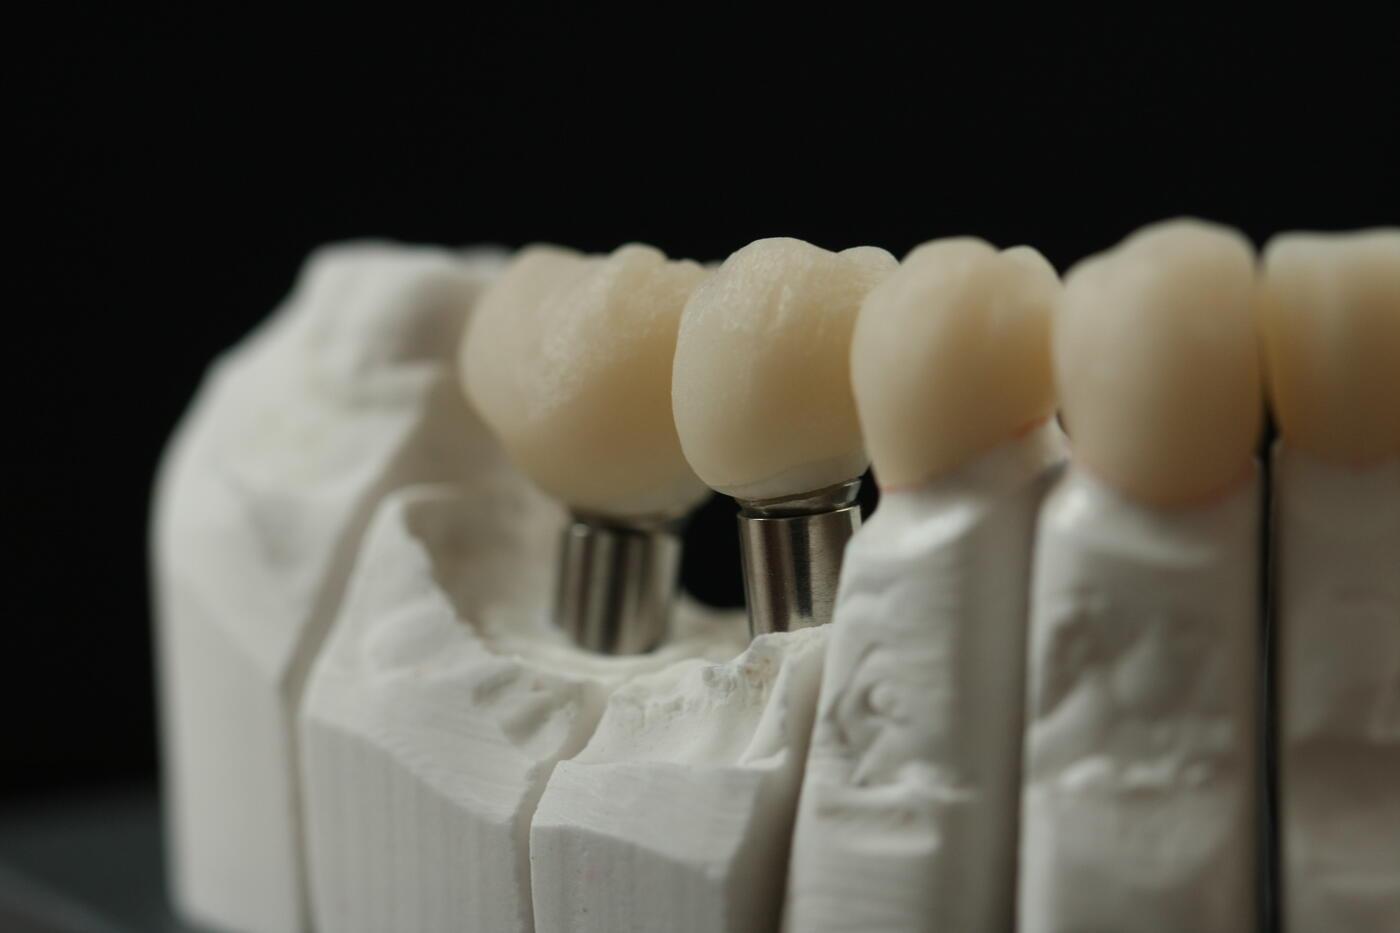 indiv. Vollkeramikaufbau auf Implantat